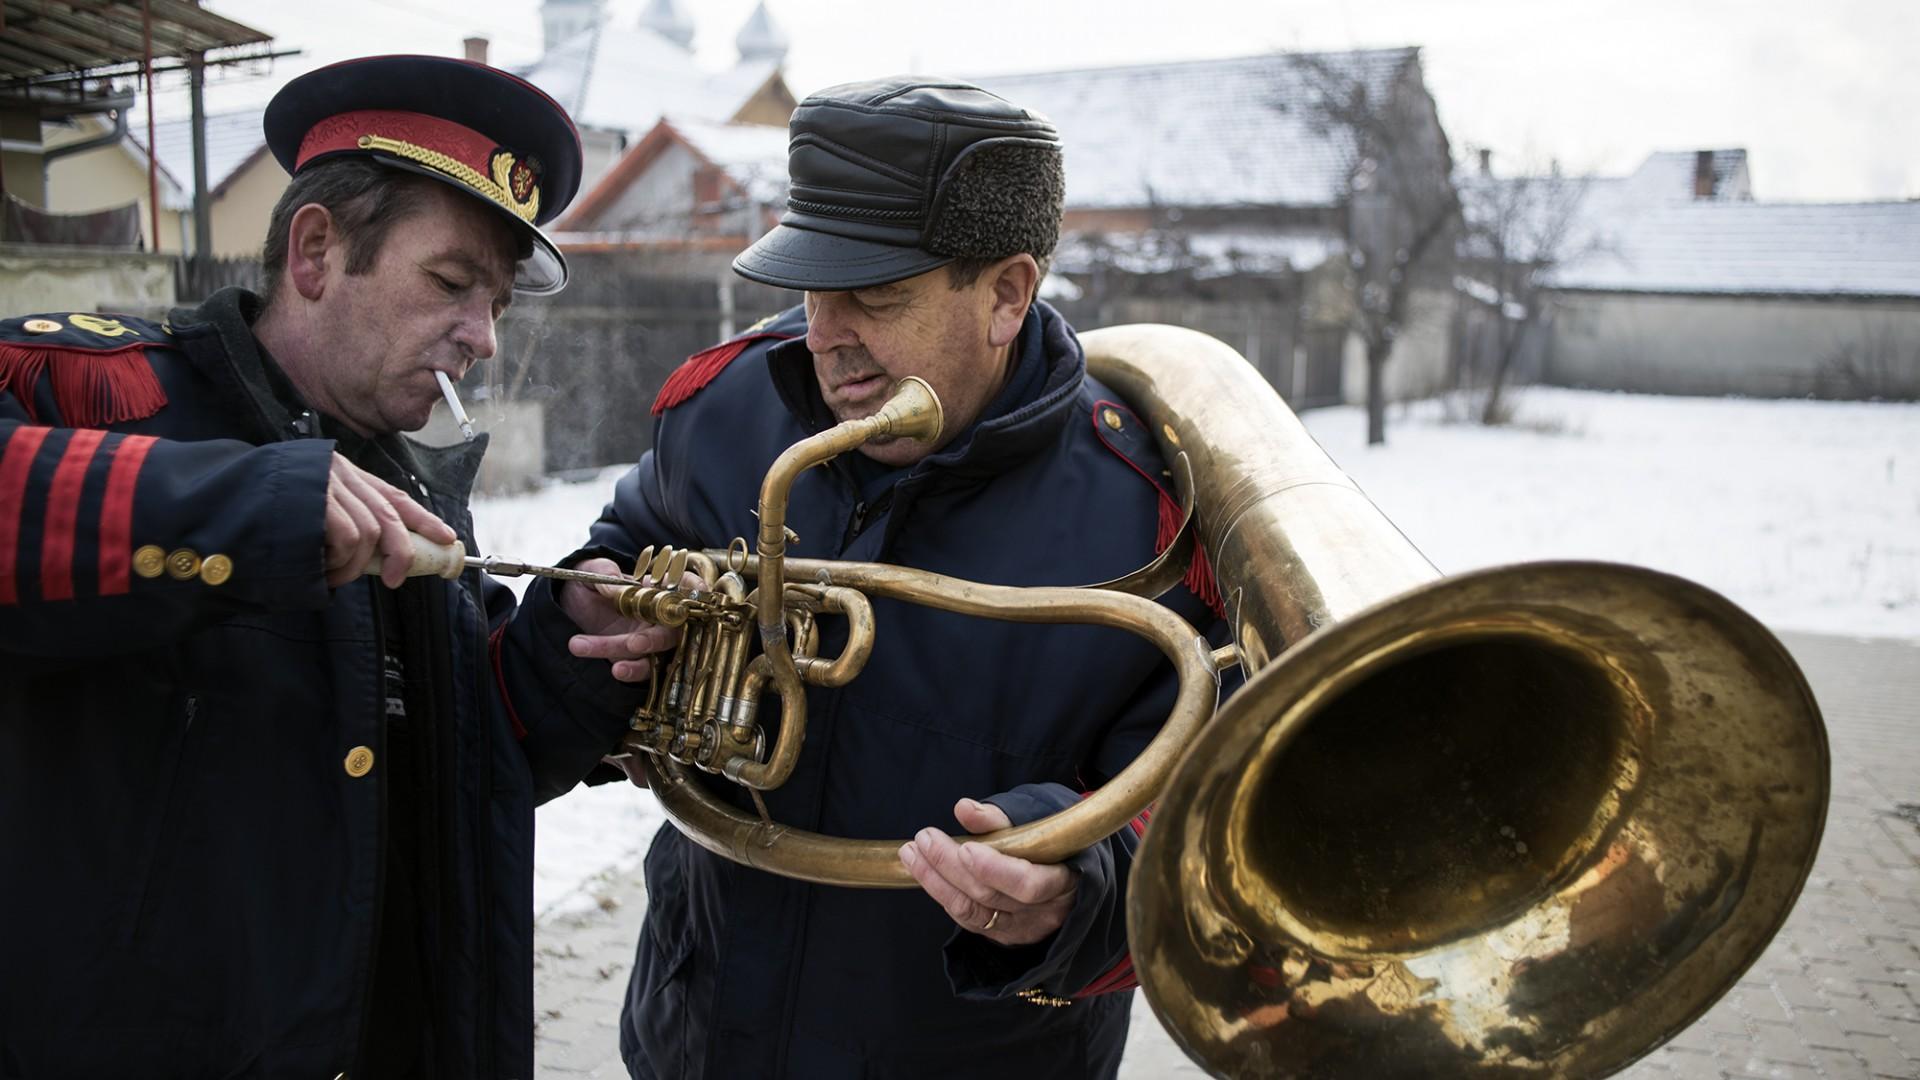 Hans, e veteranul fanfarei la 73 de ani